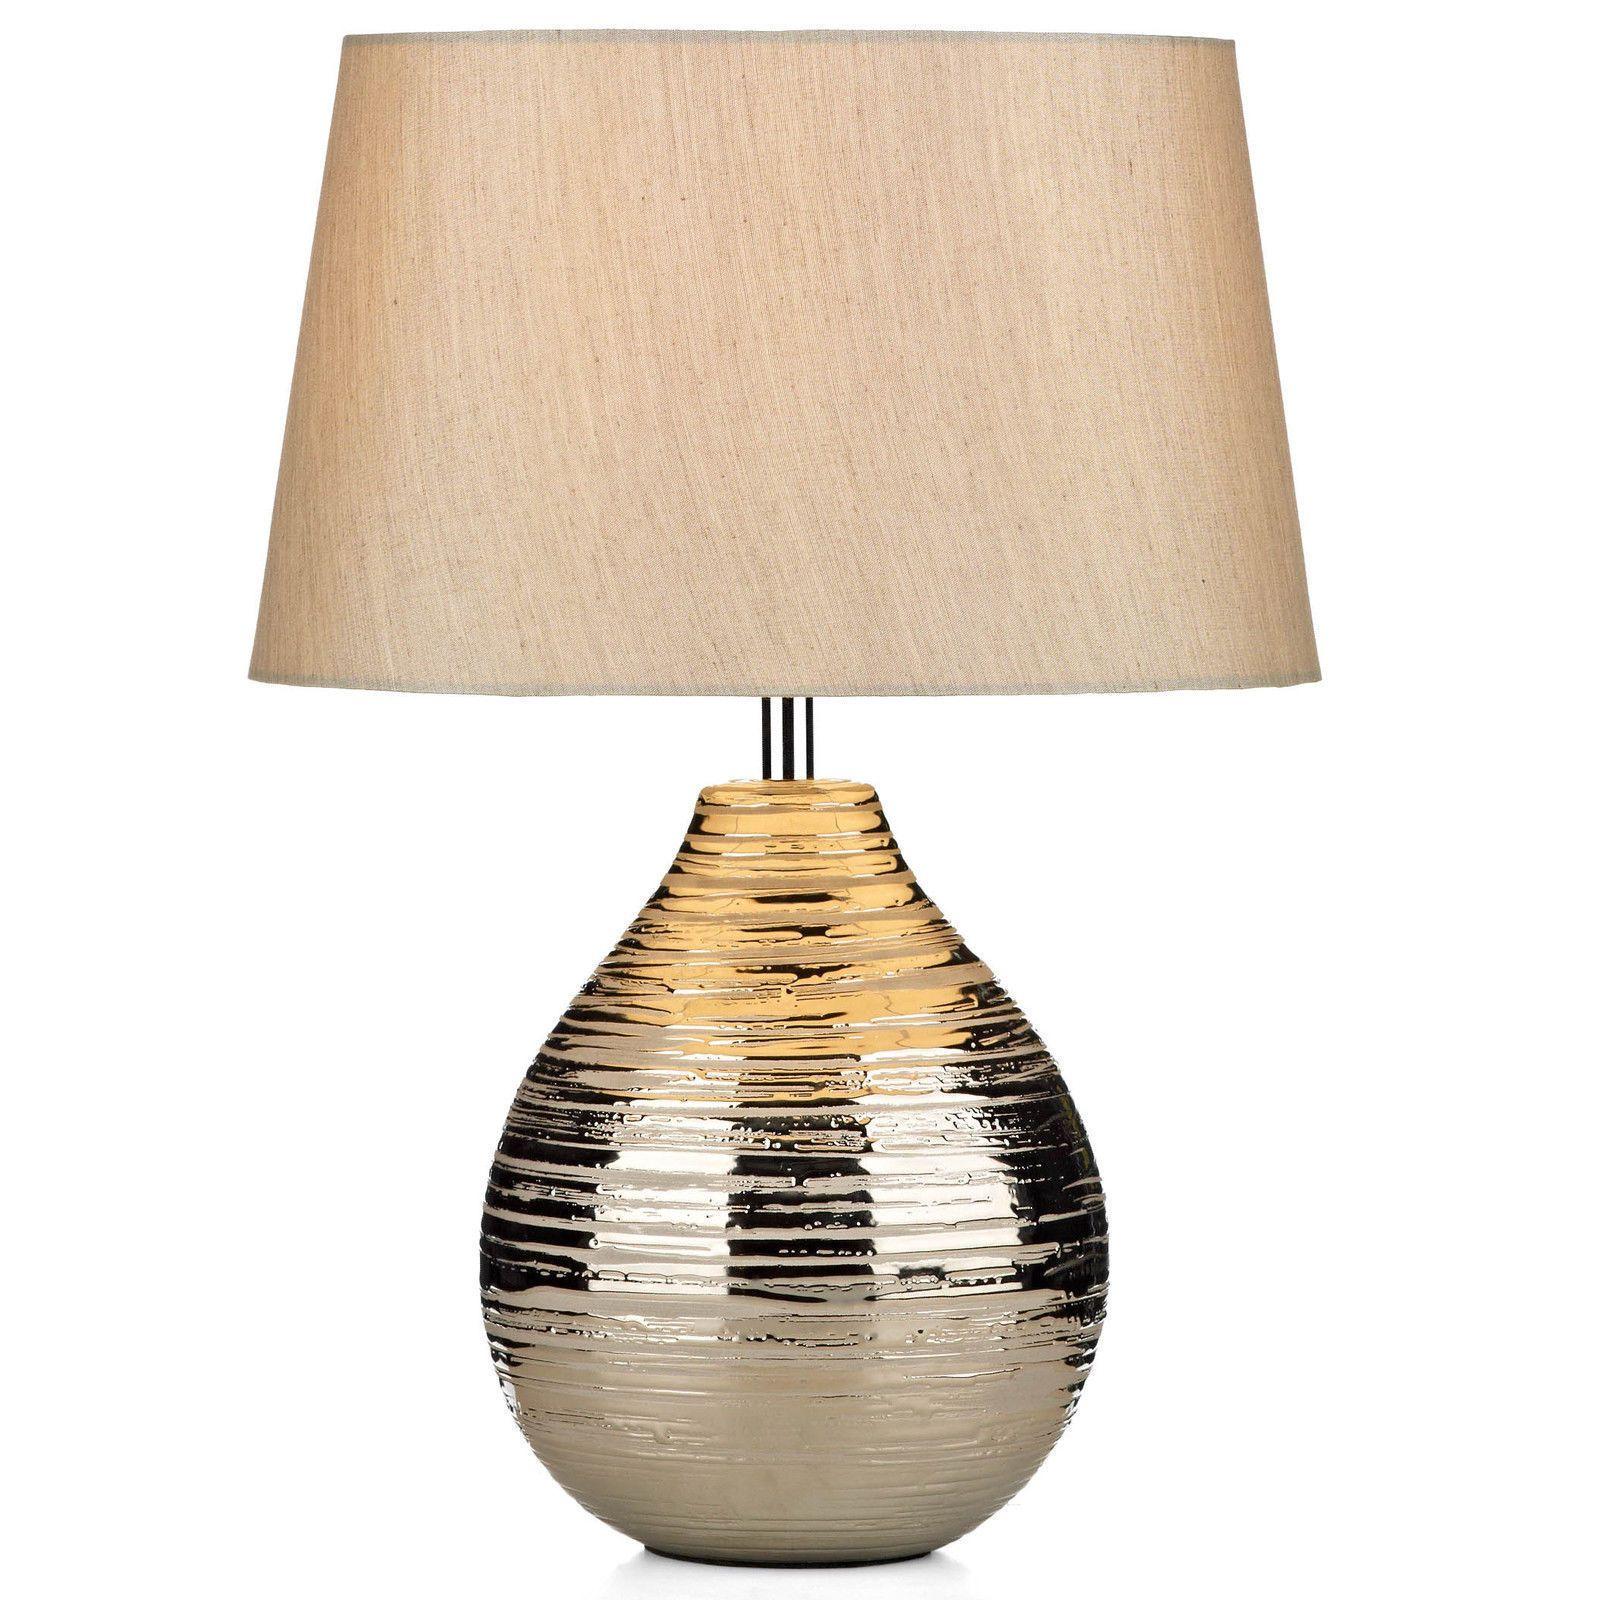 Gustav Table Bedside Lamp Silver Ceramic Base Cream Shade Ebay Small Table Lamp Table Lamp Gold Table Lamp